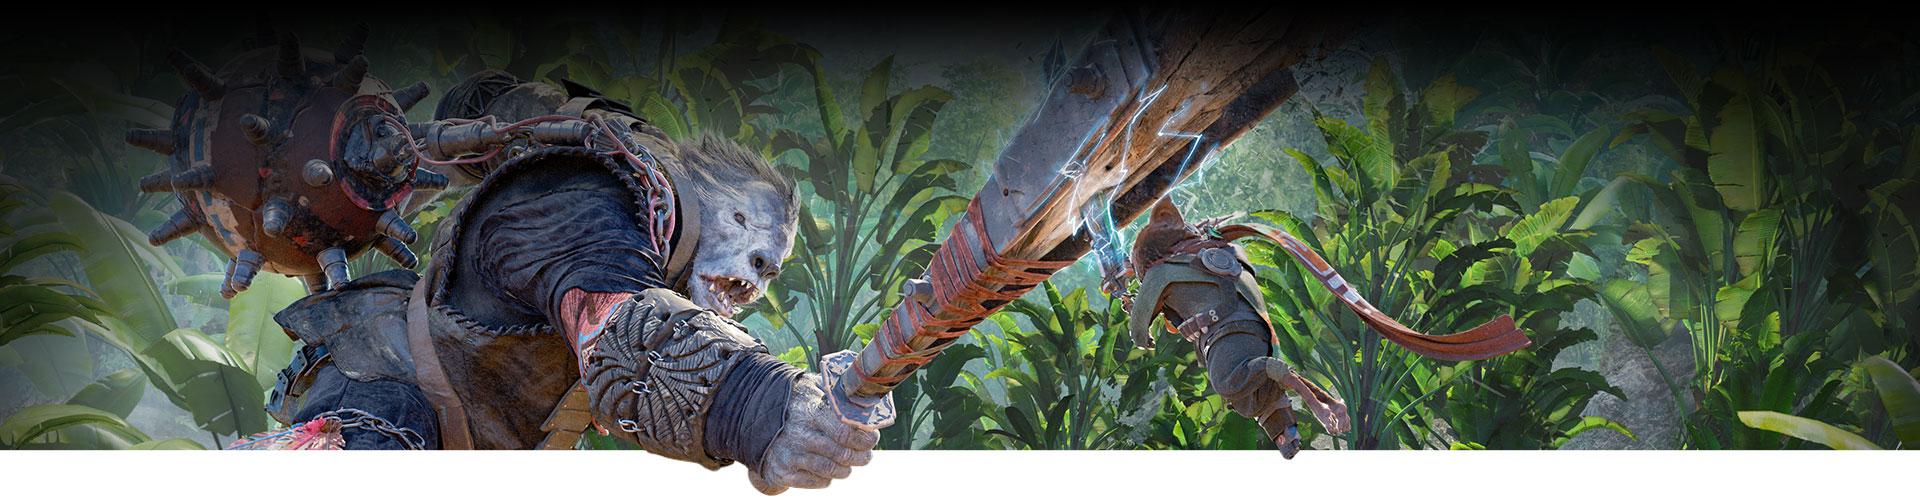 Un gran monstruo golpea a un personaje mutante con un bate enorme.